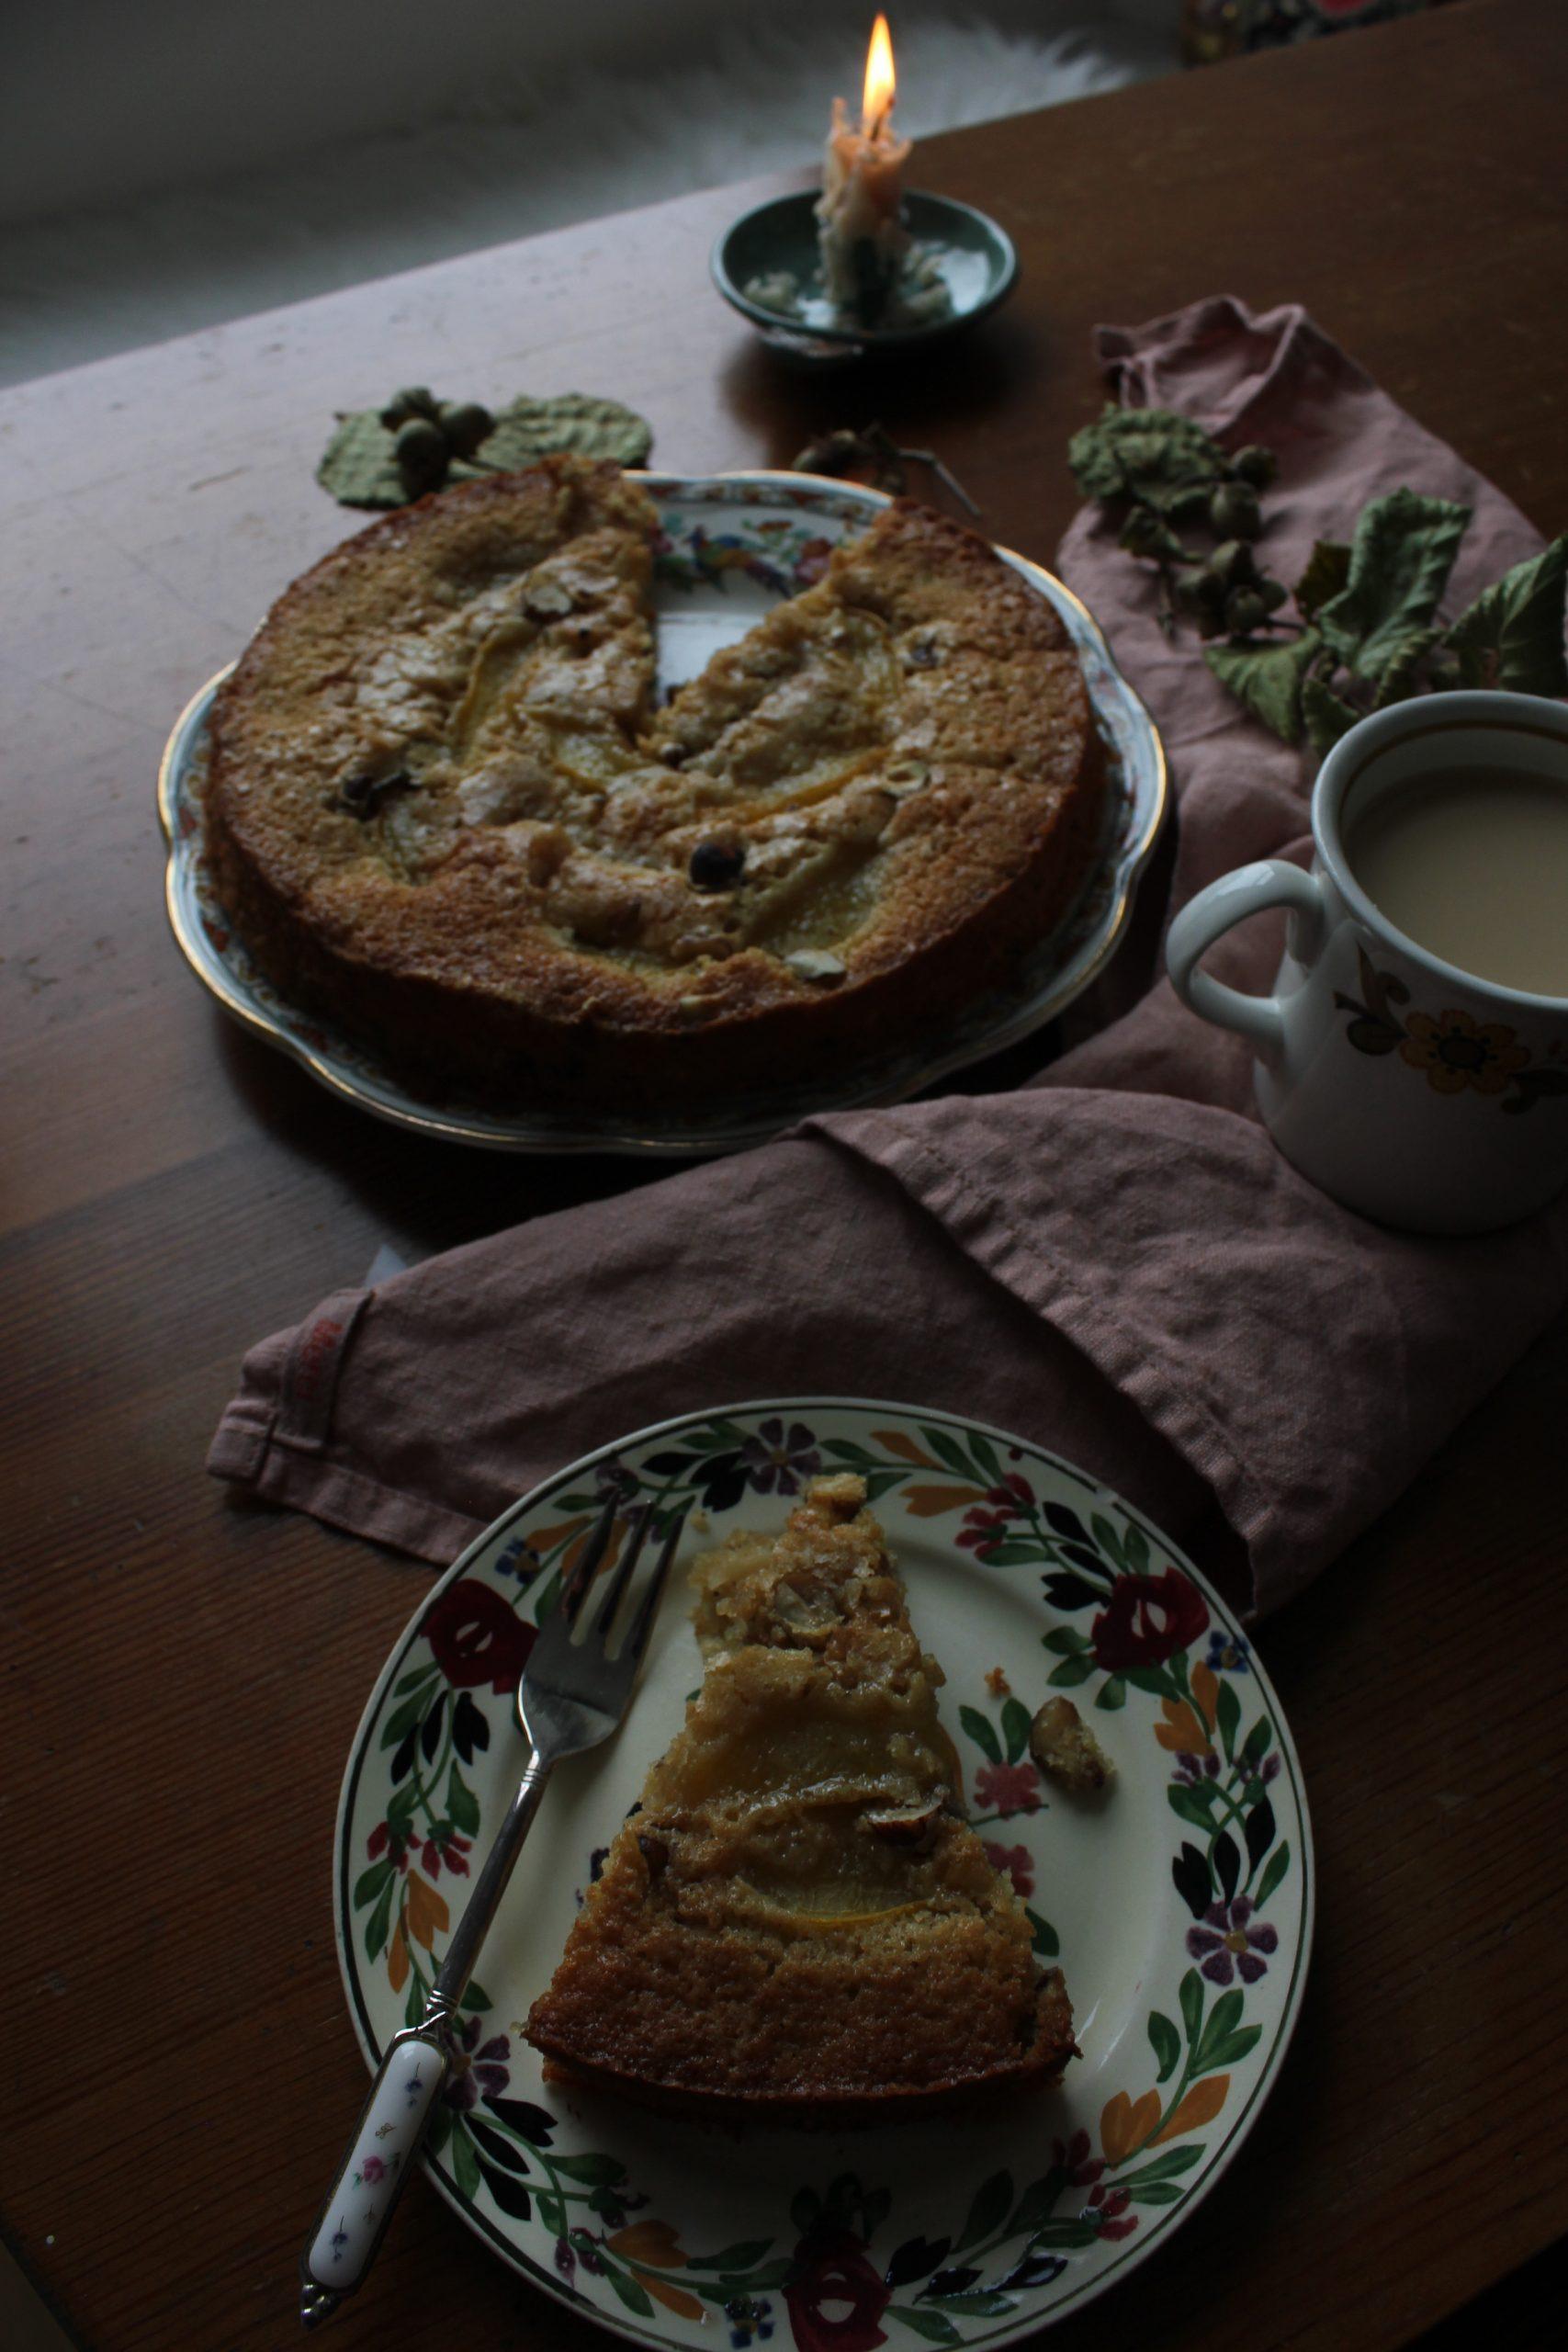 Plum, Hazelnut and Chocolate Cake